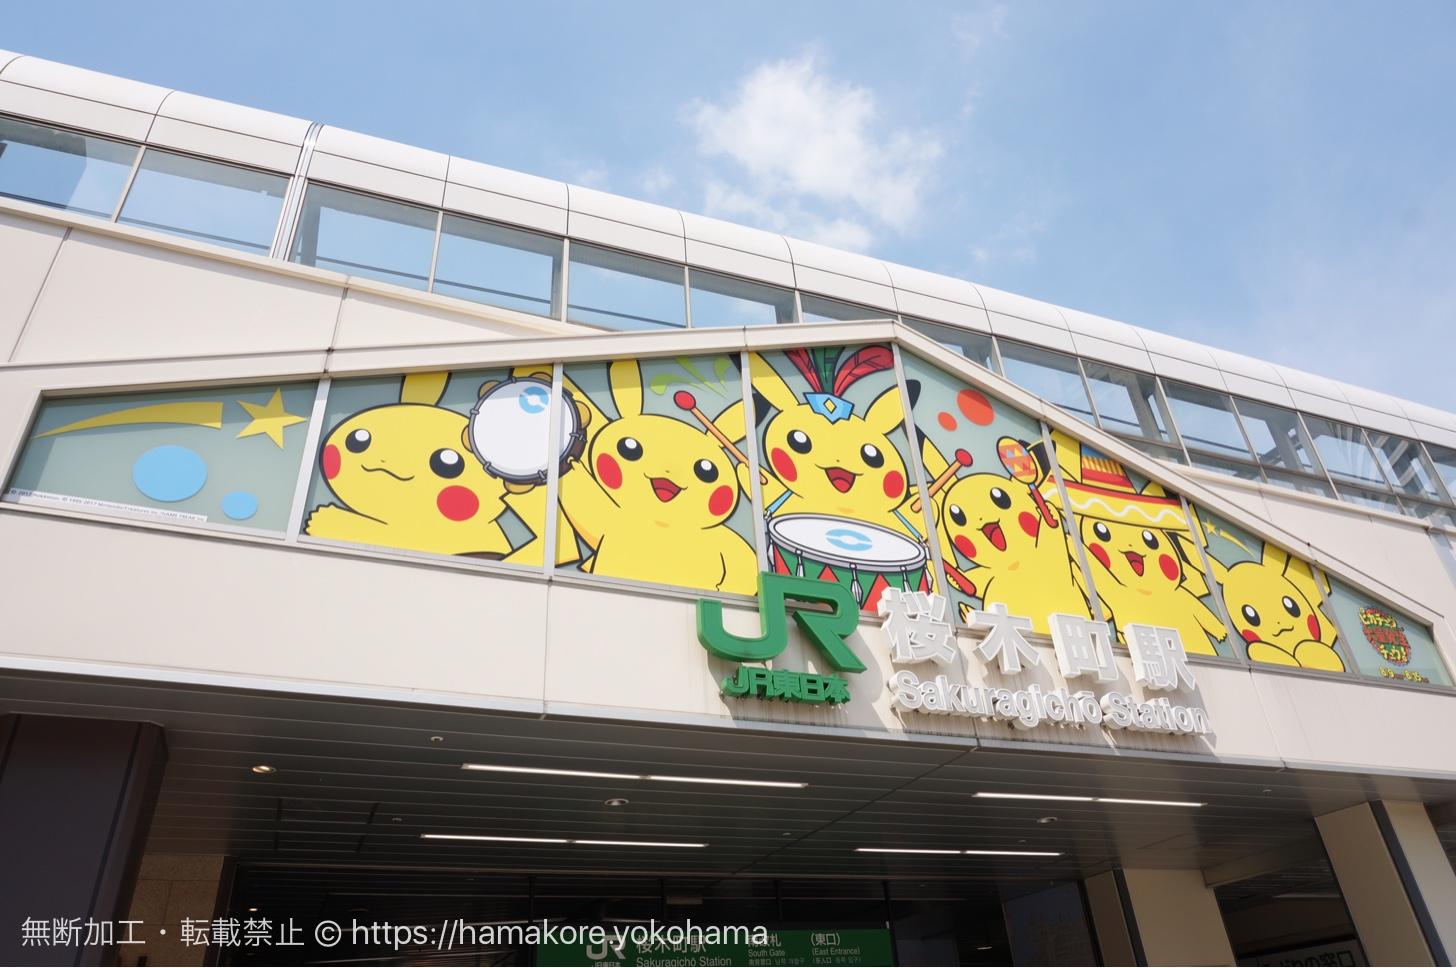 JR桜木町駅 屋外ガラス壁面のピカチュウ装飾